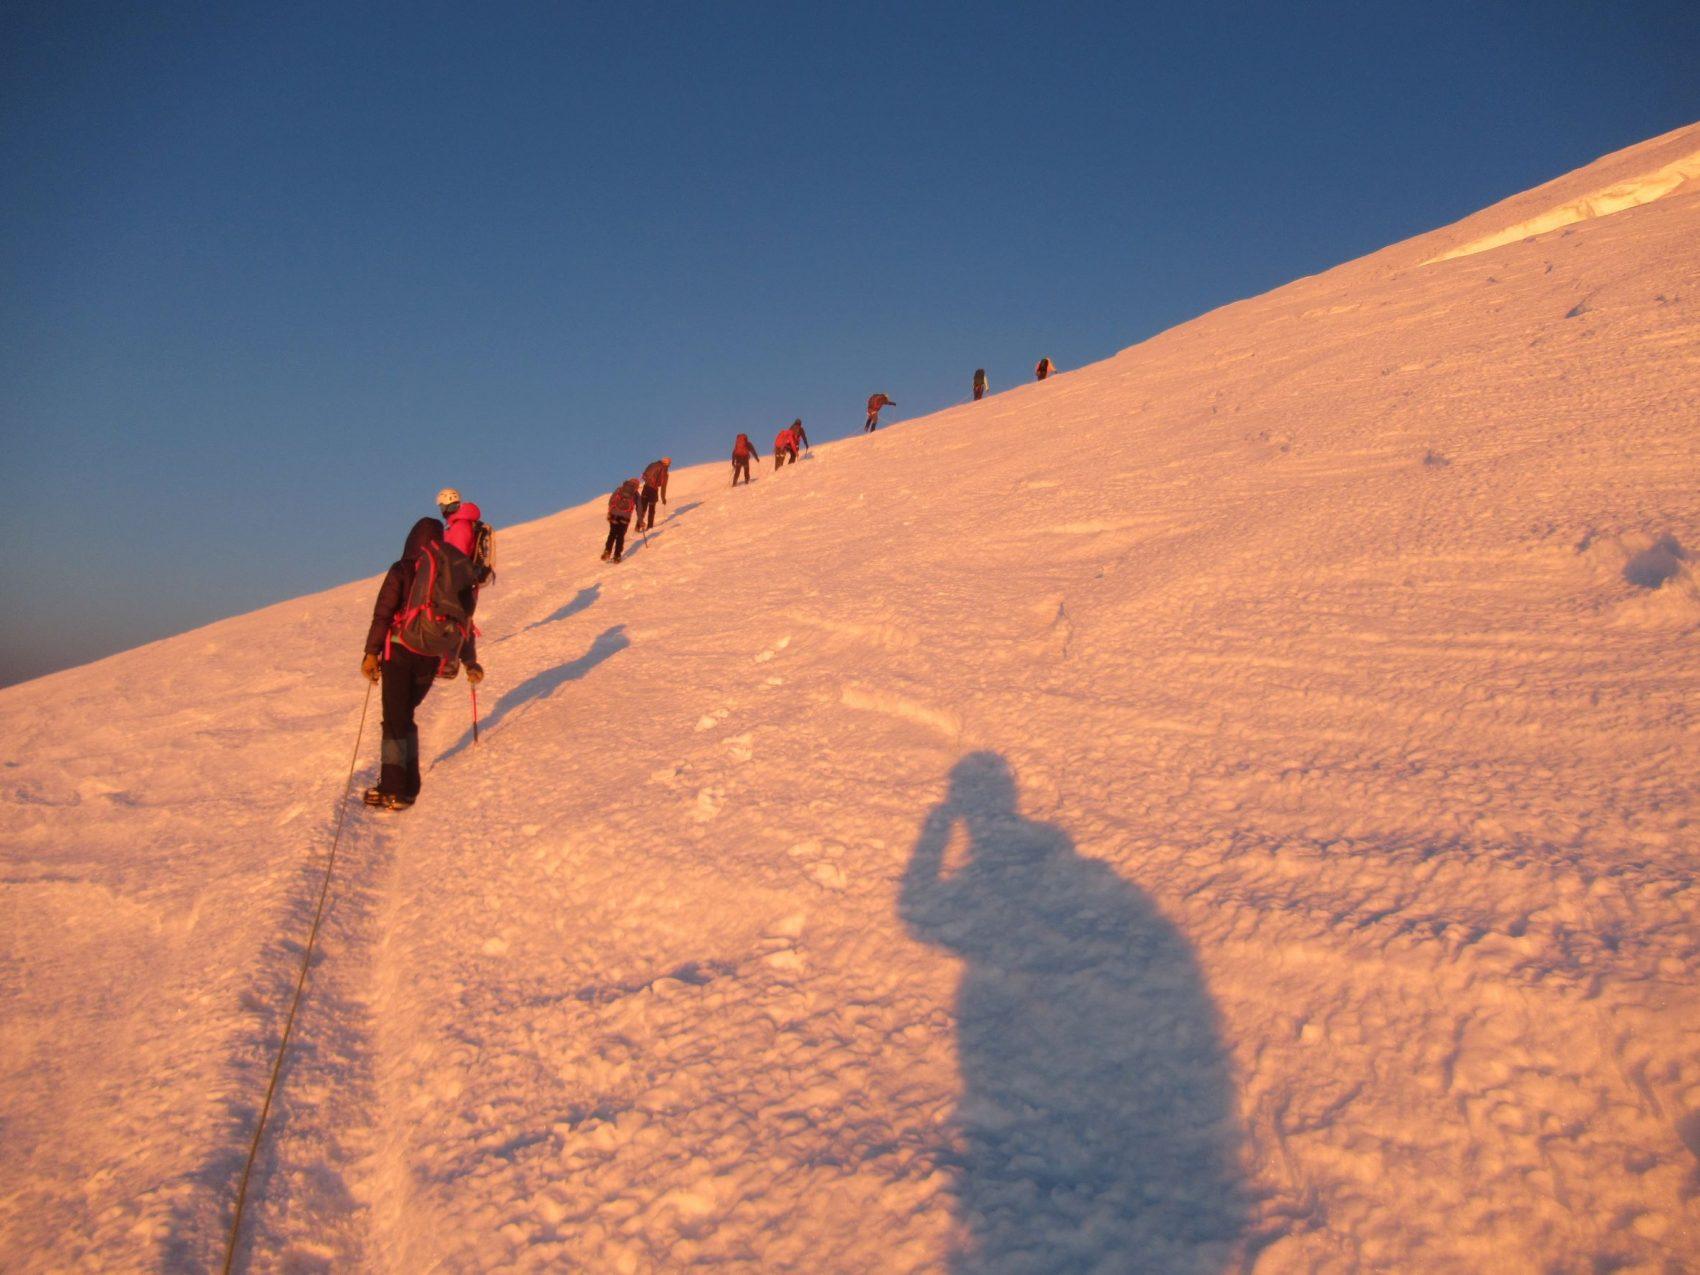 Climbers on mountain, rainier, washington,